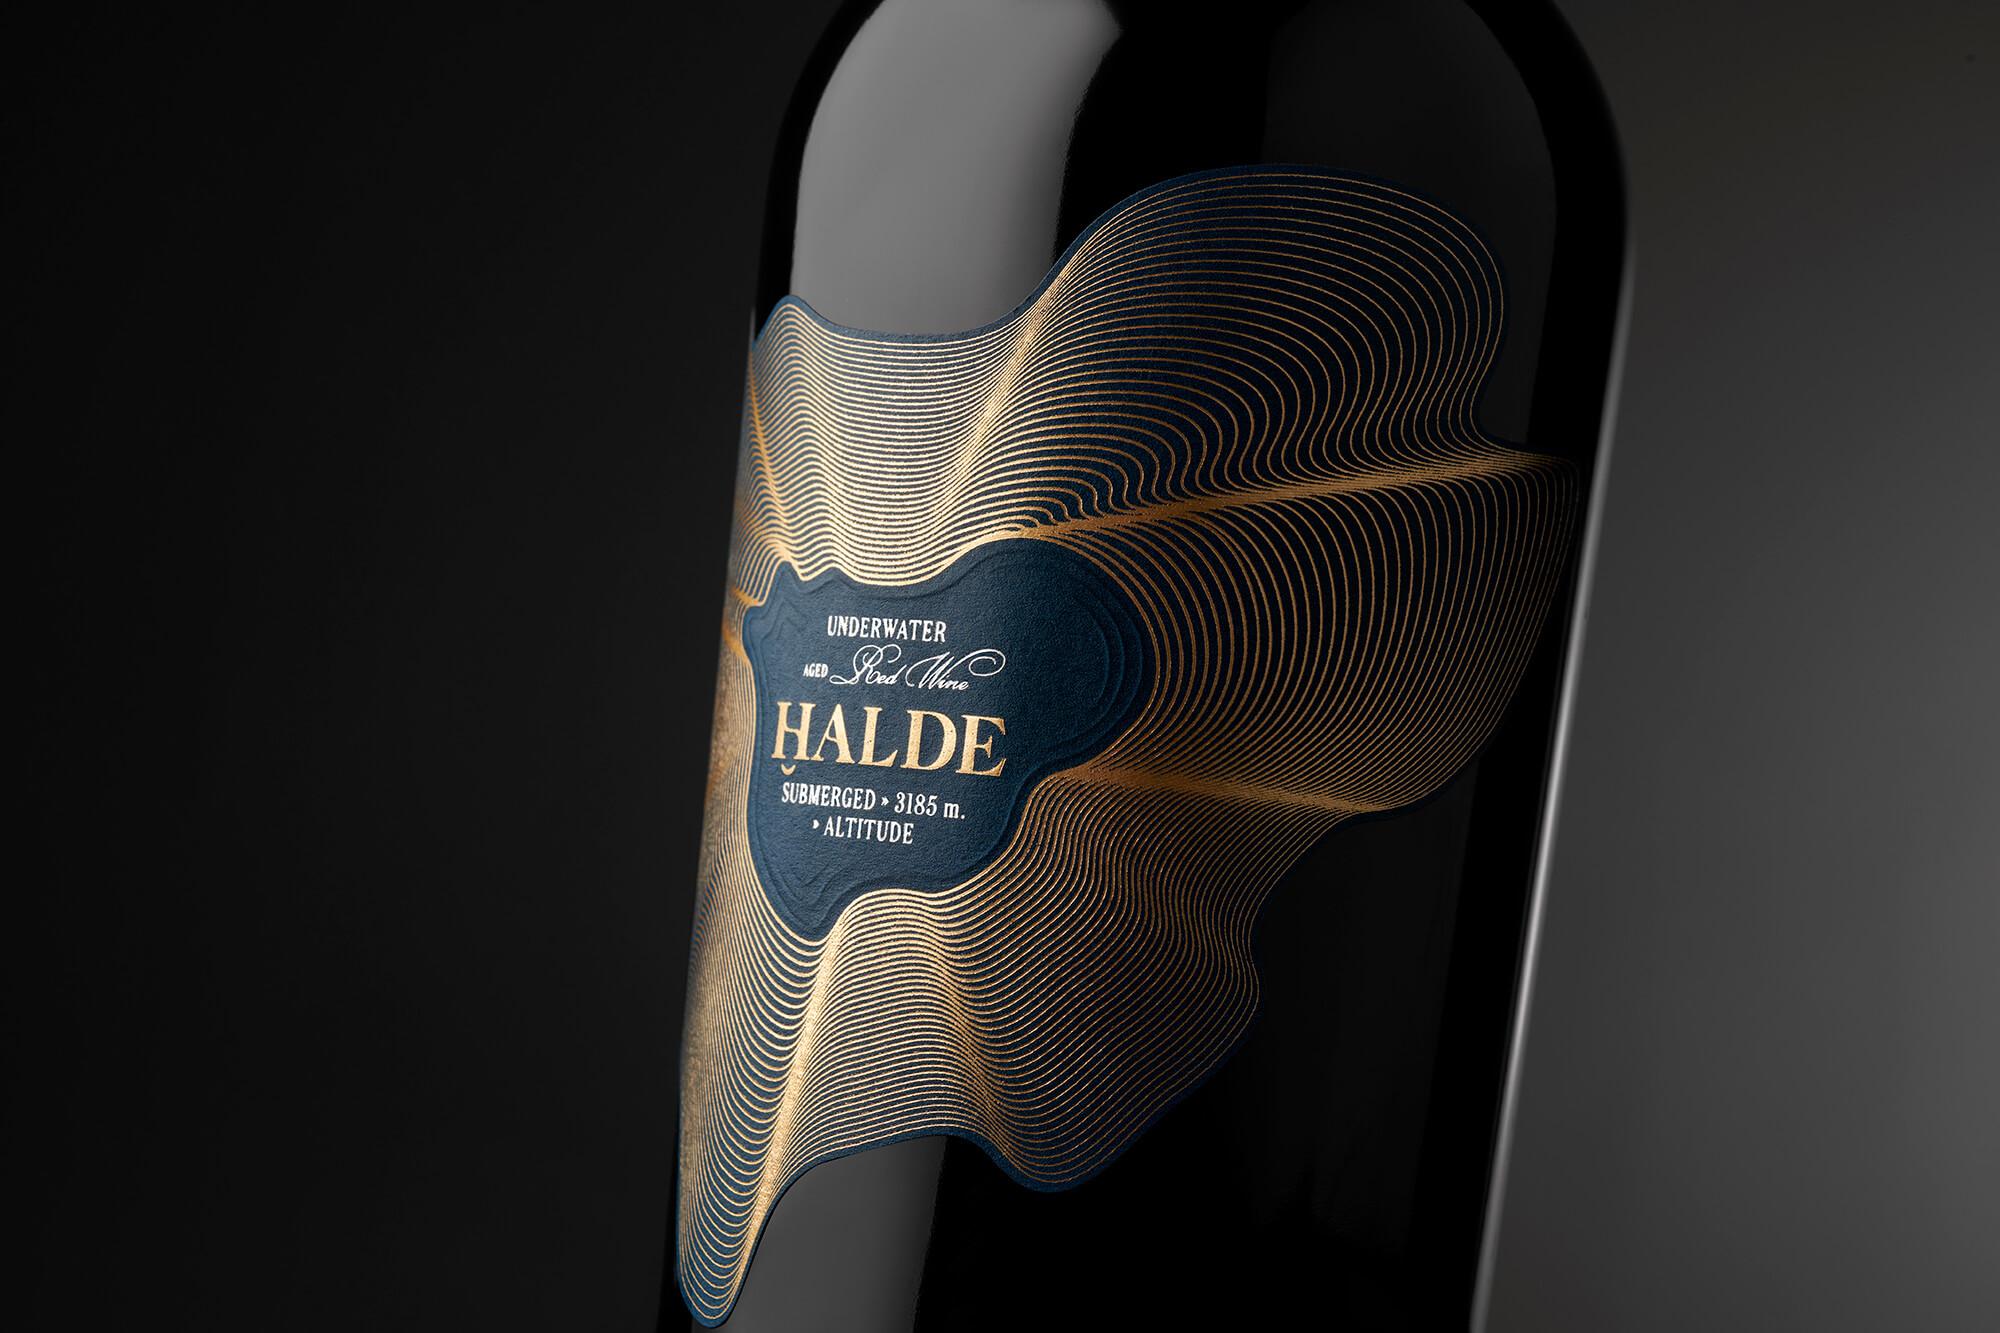 HALDE2